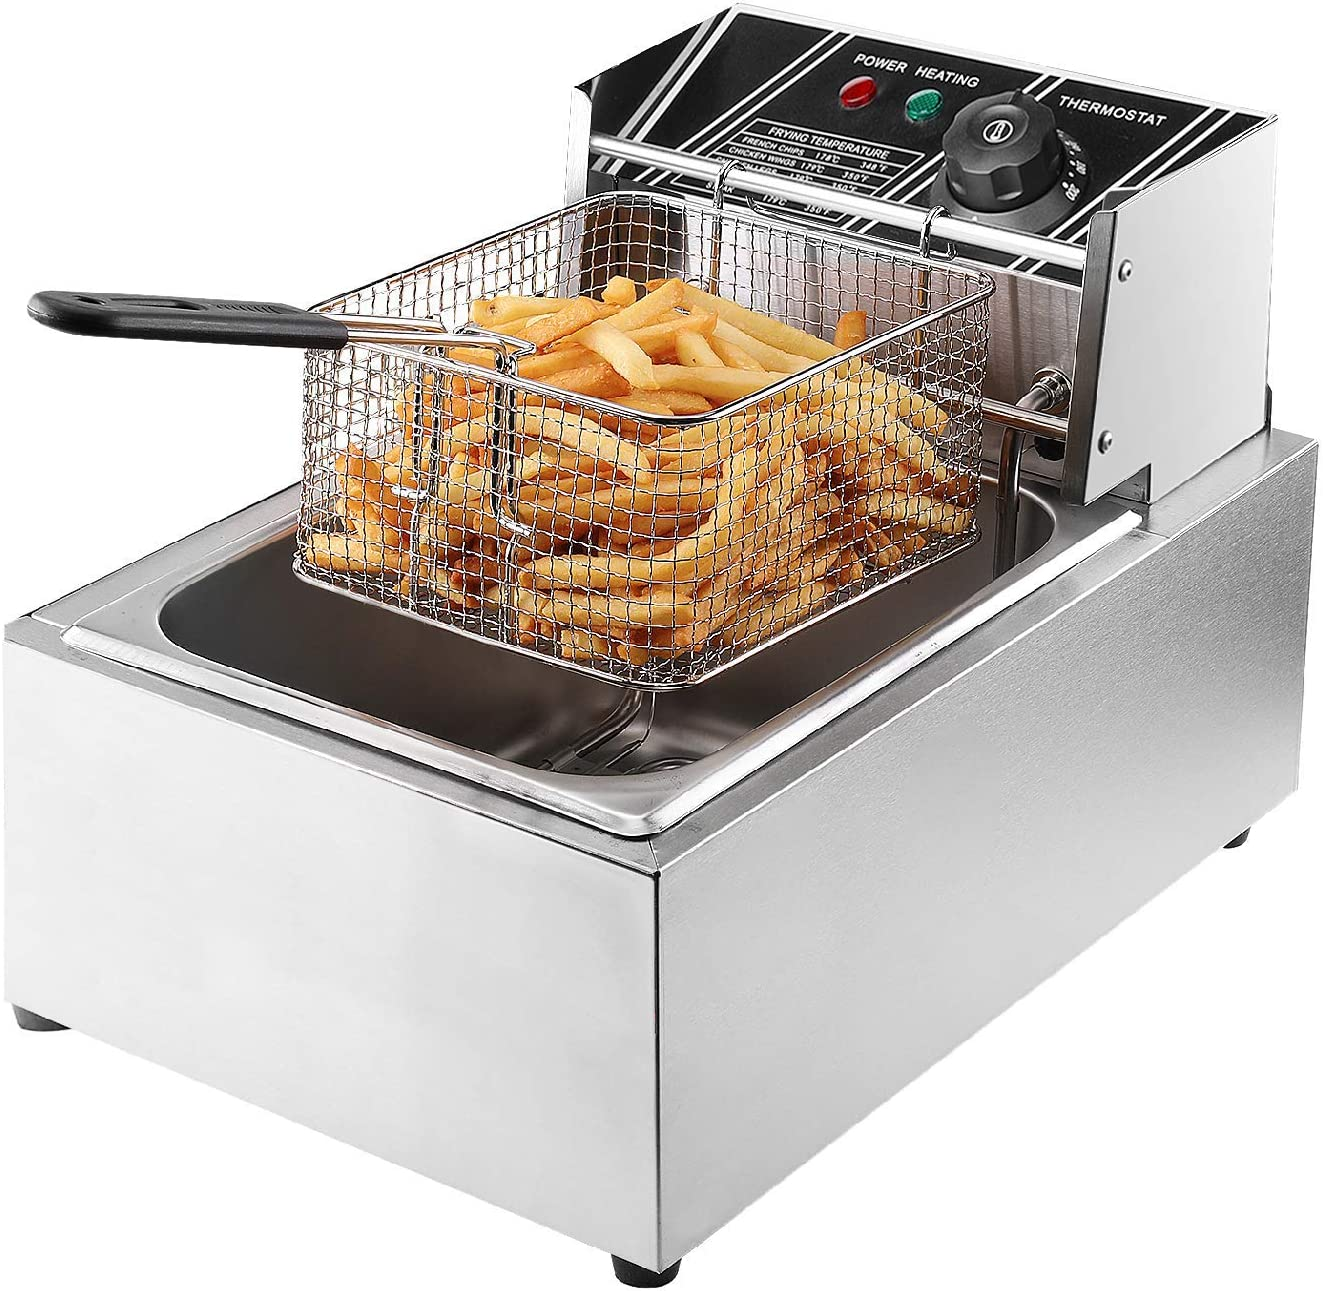 Flexzion Deep Fryer with Basket - New sales 2500W supreme Steel Stainless 6 Liter